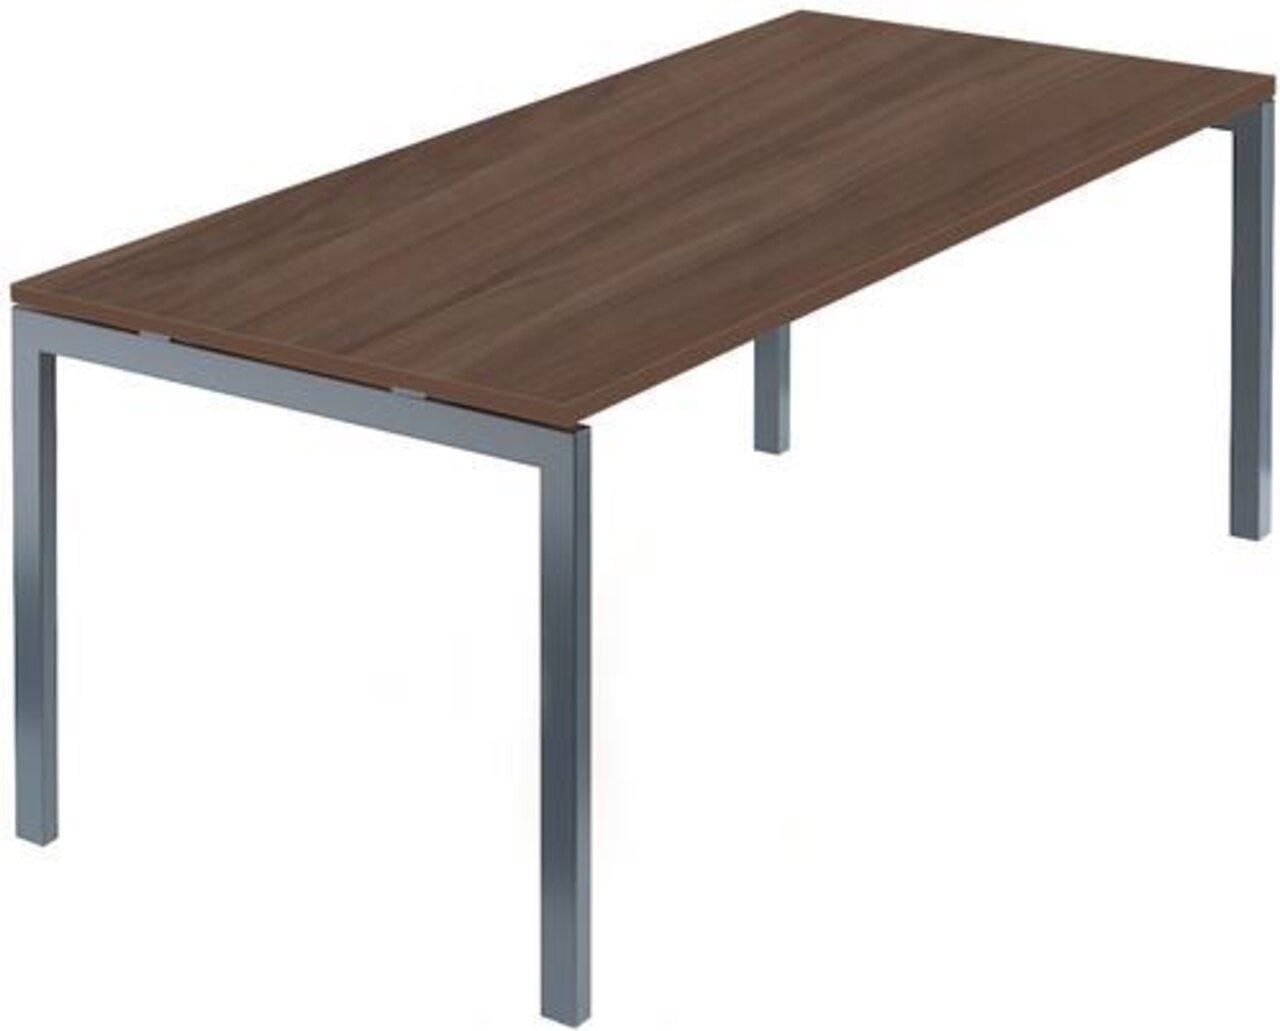 Стол на м/каркасе для заседаний/антрацит Арго 180x85x76 - фото 8